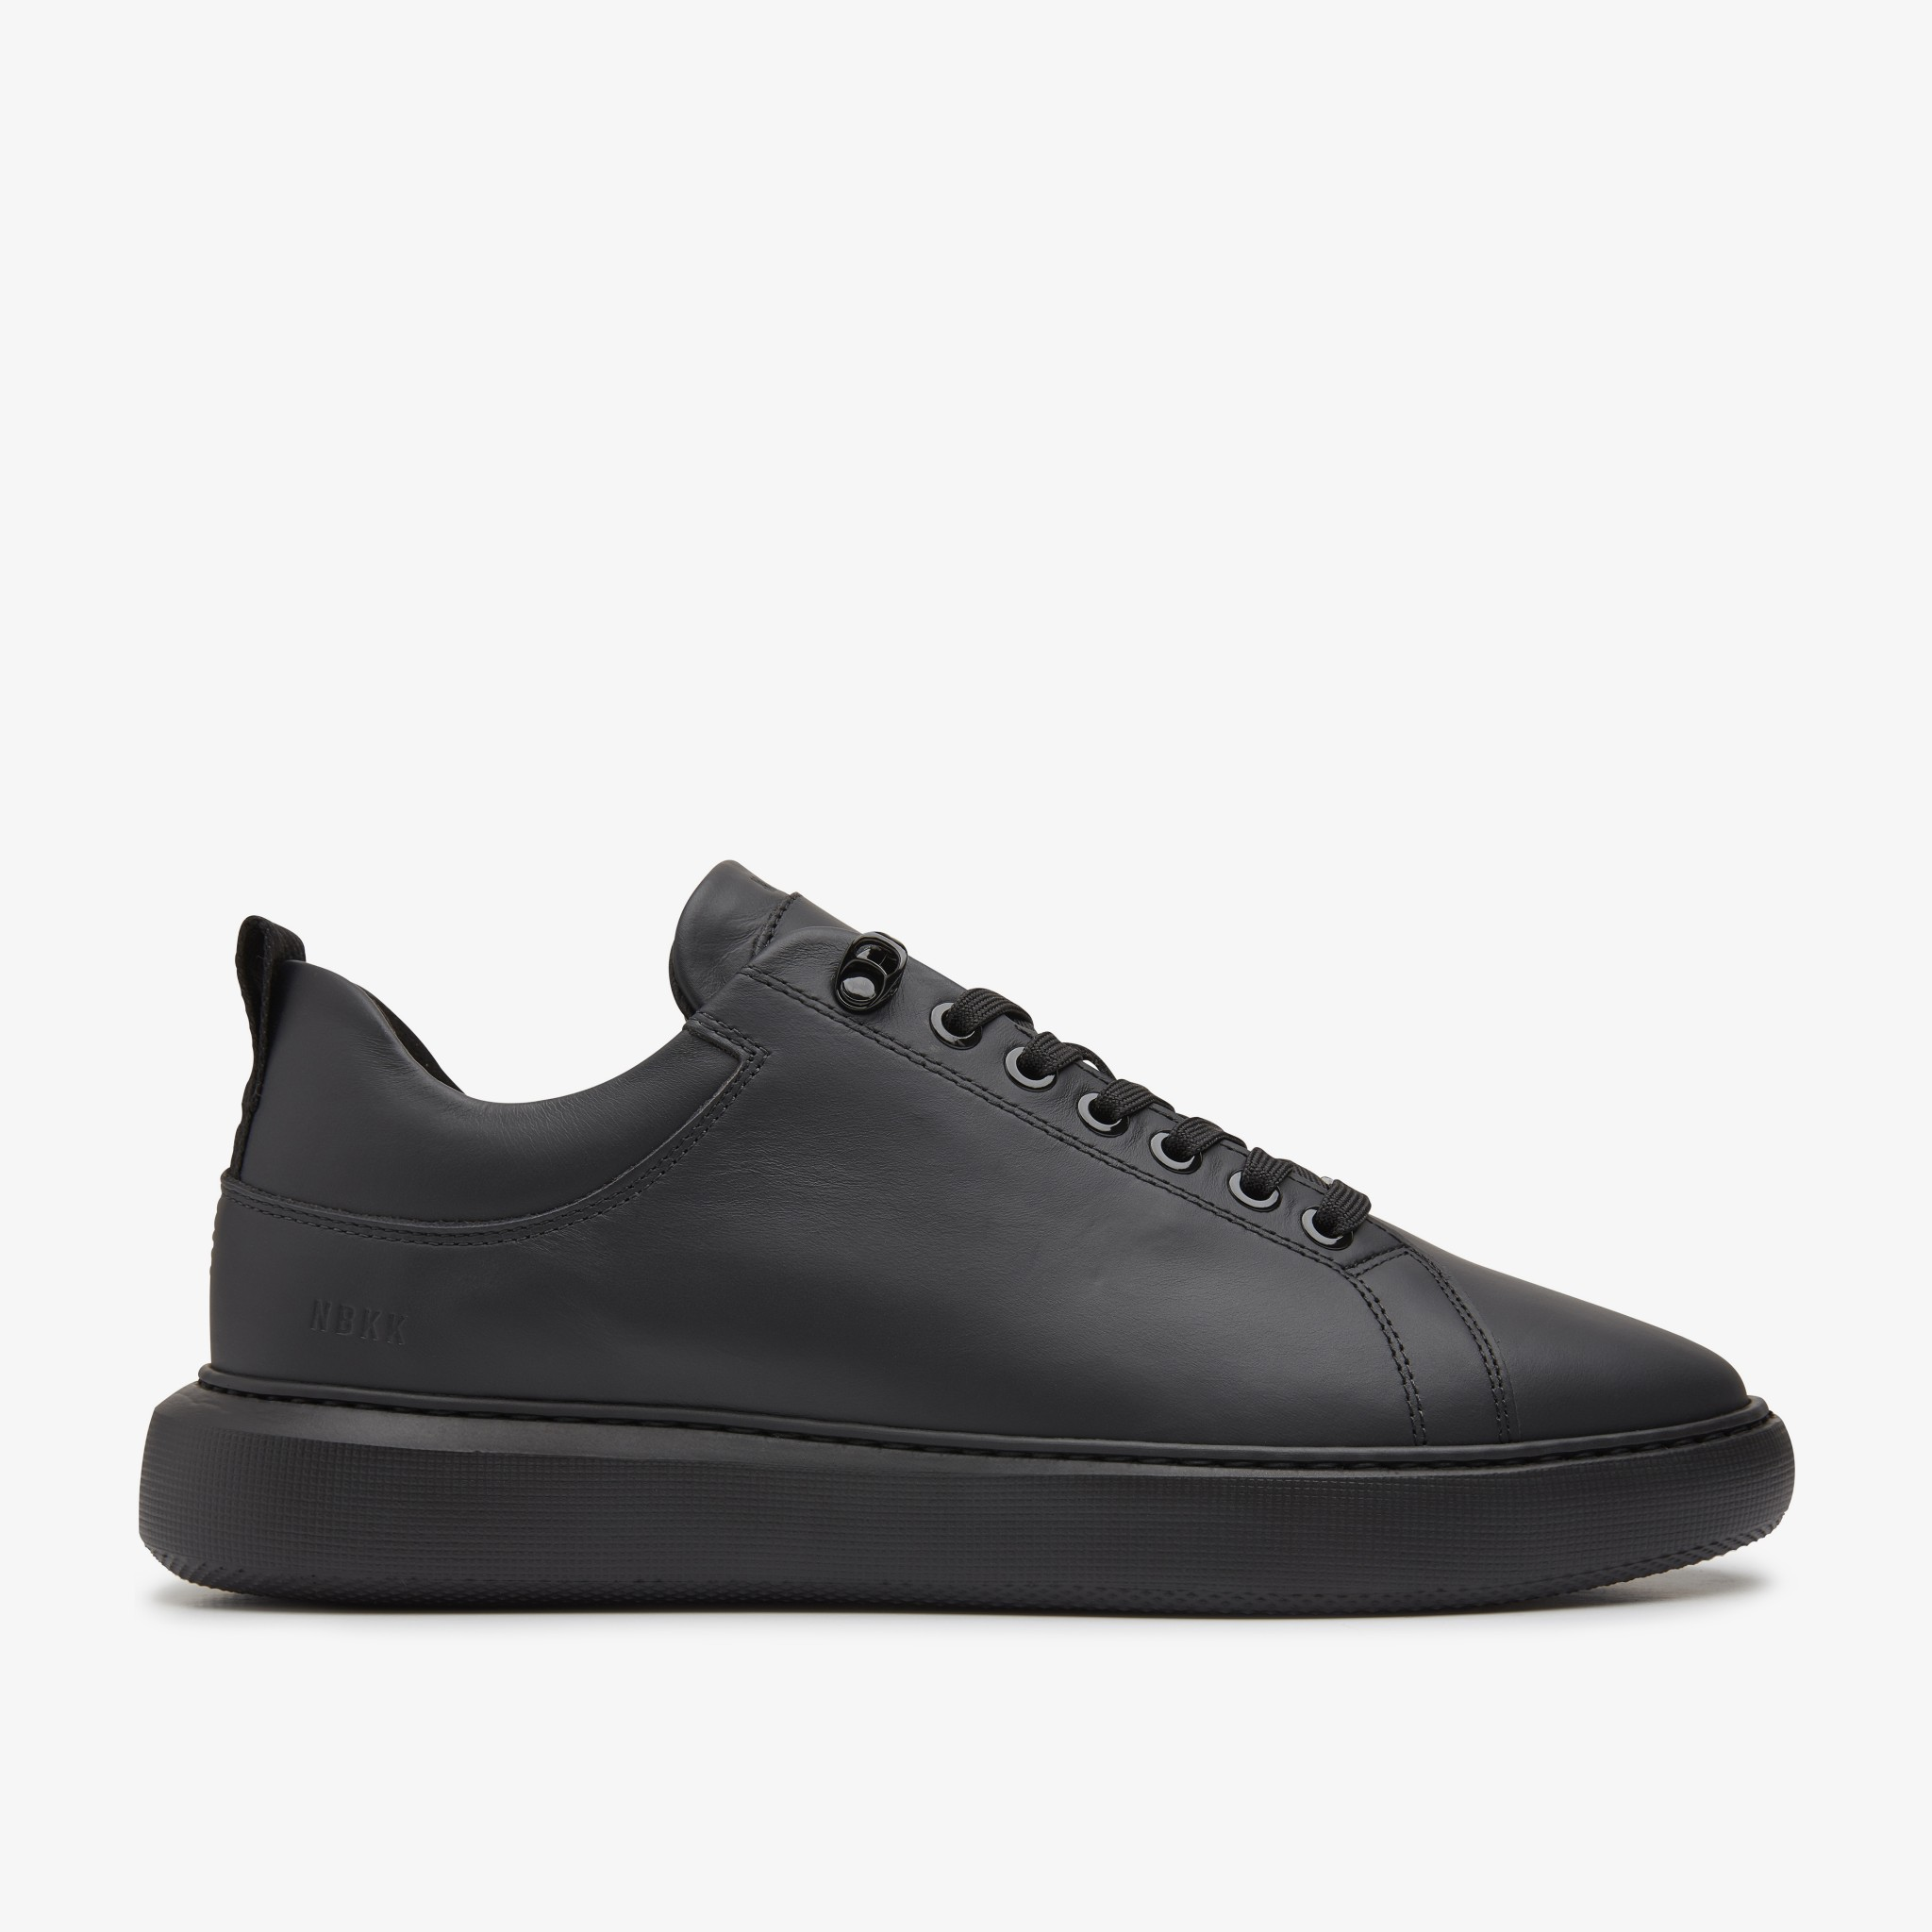 nubikk-scott-marlow-black-raven-leather_11Tjwgw0rhxmZH_2048x2048